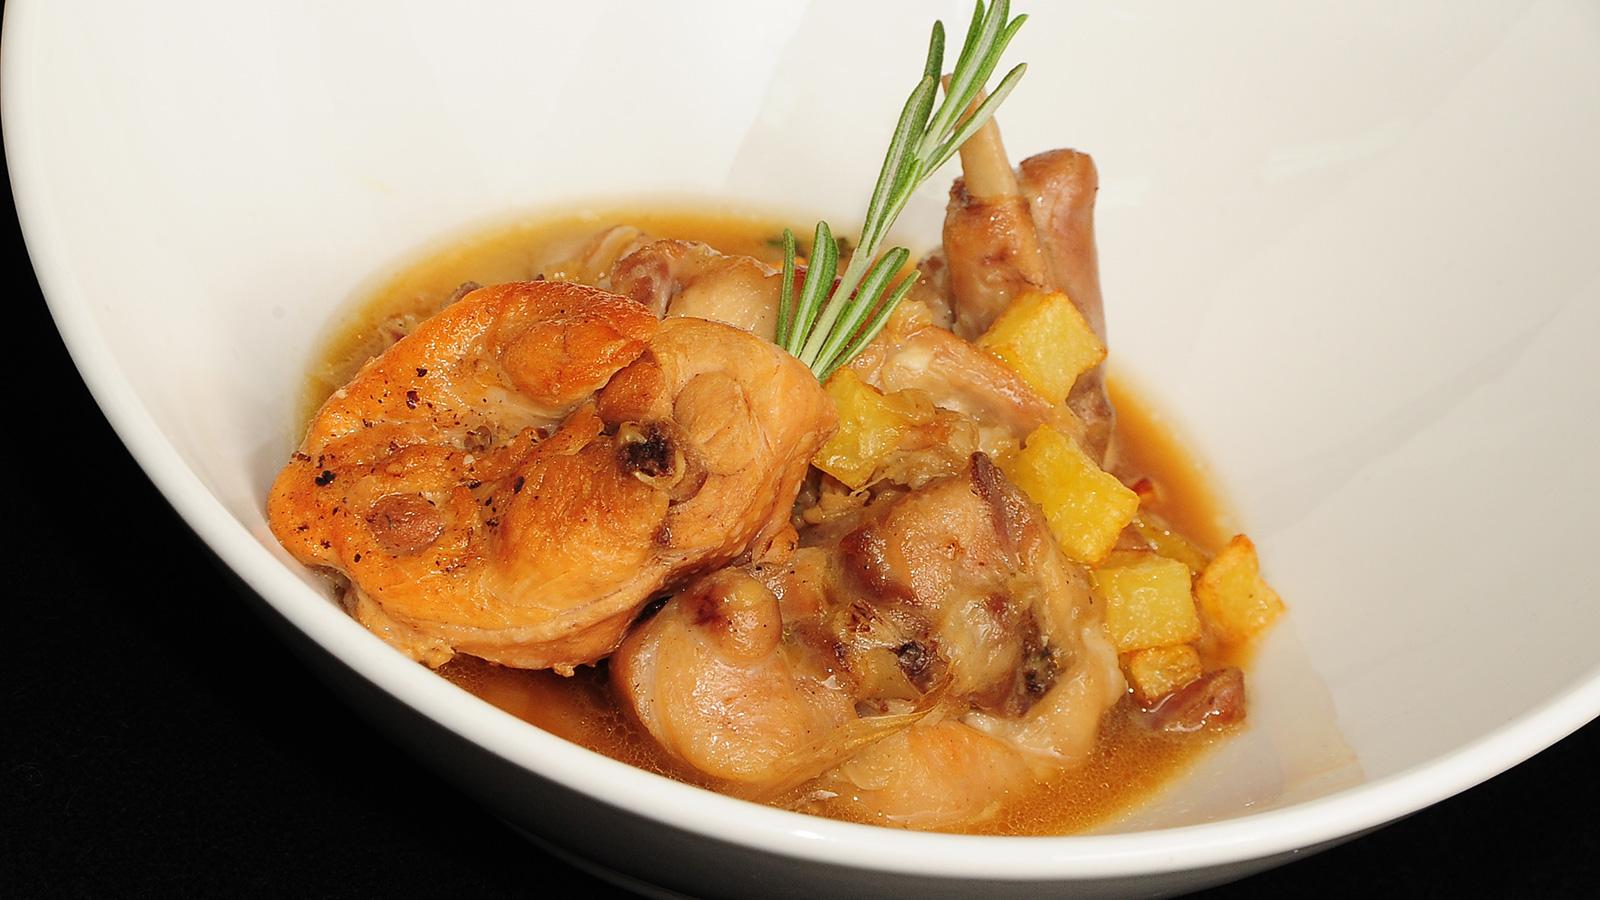 Conejo en salsa sergio fern ndez receta canal cocina for Canal cocina sergio fernandez